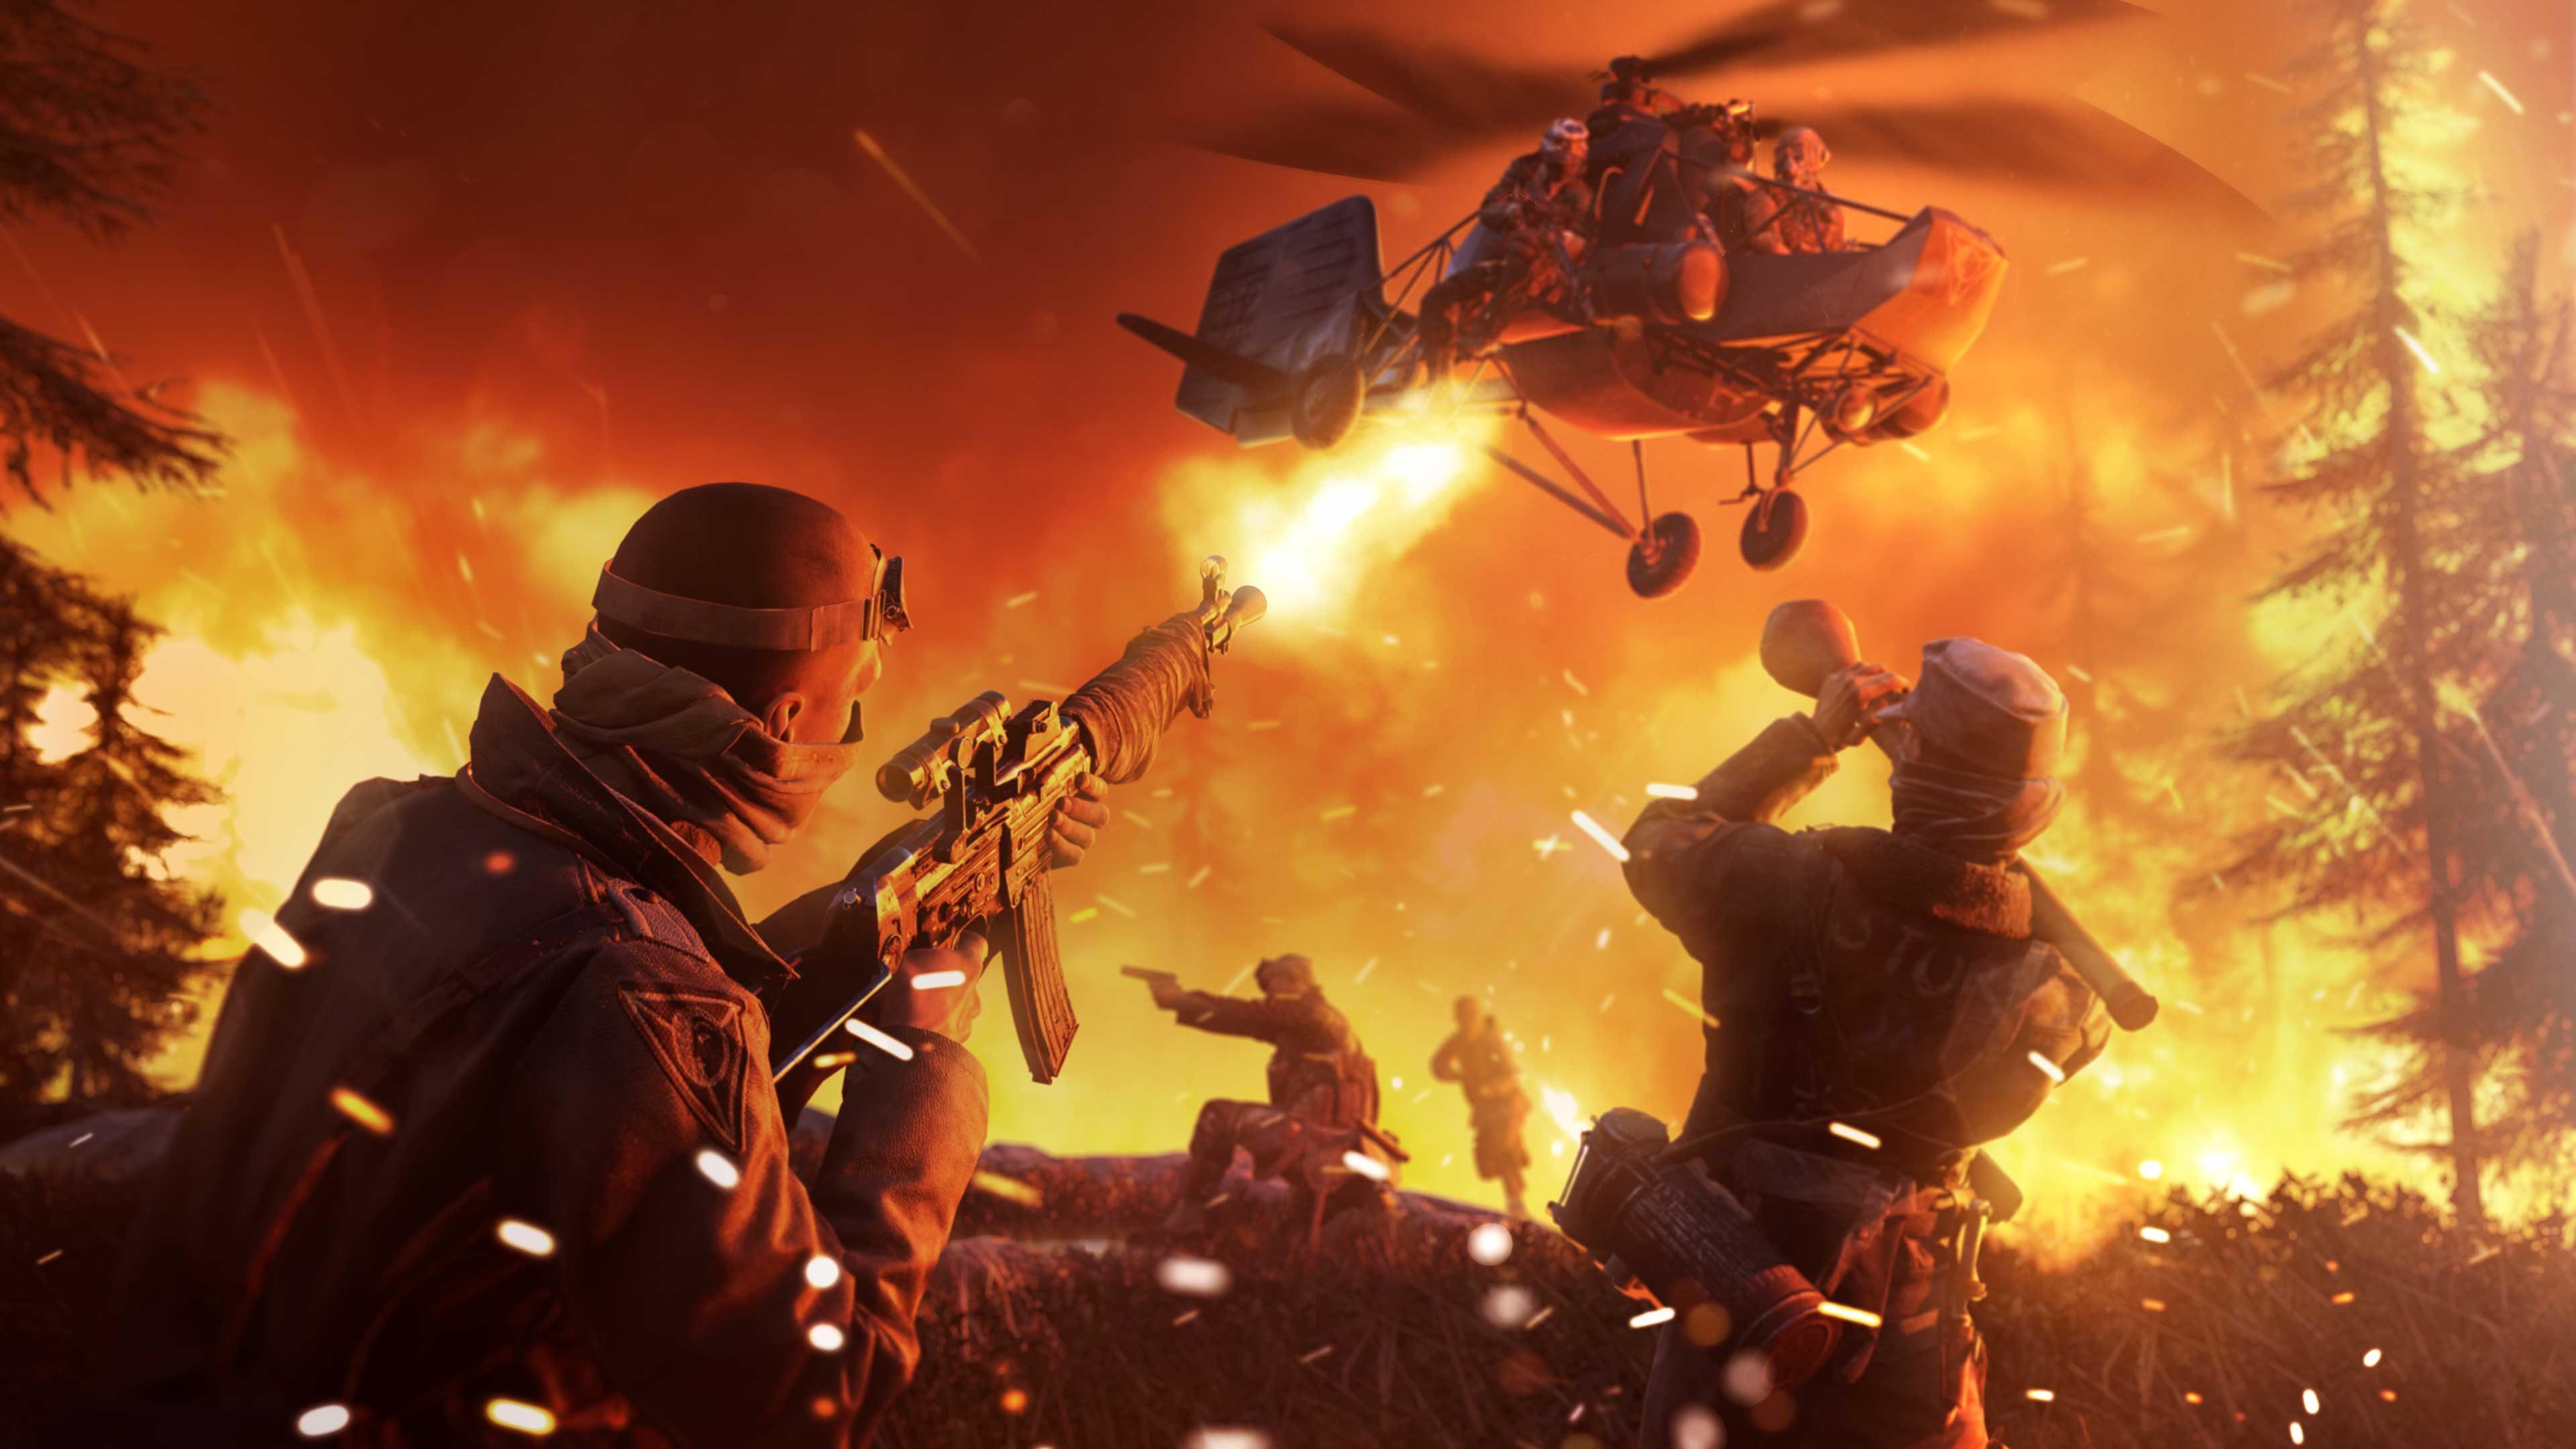 battlefield_5_firestorm_image_2.jpg